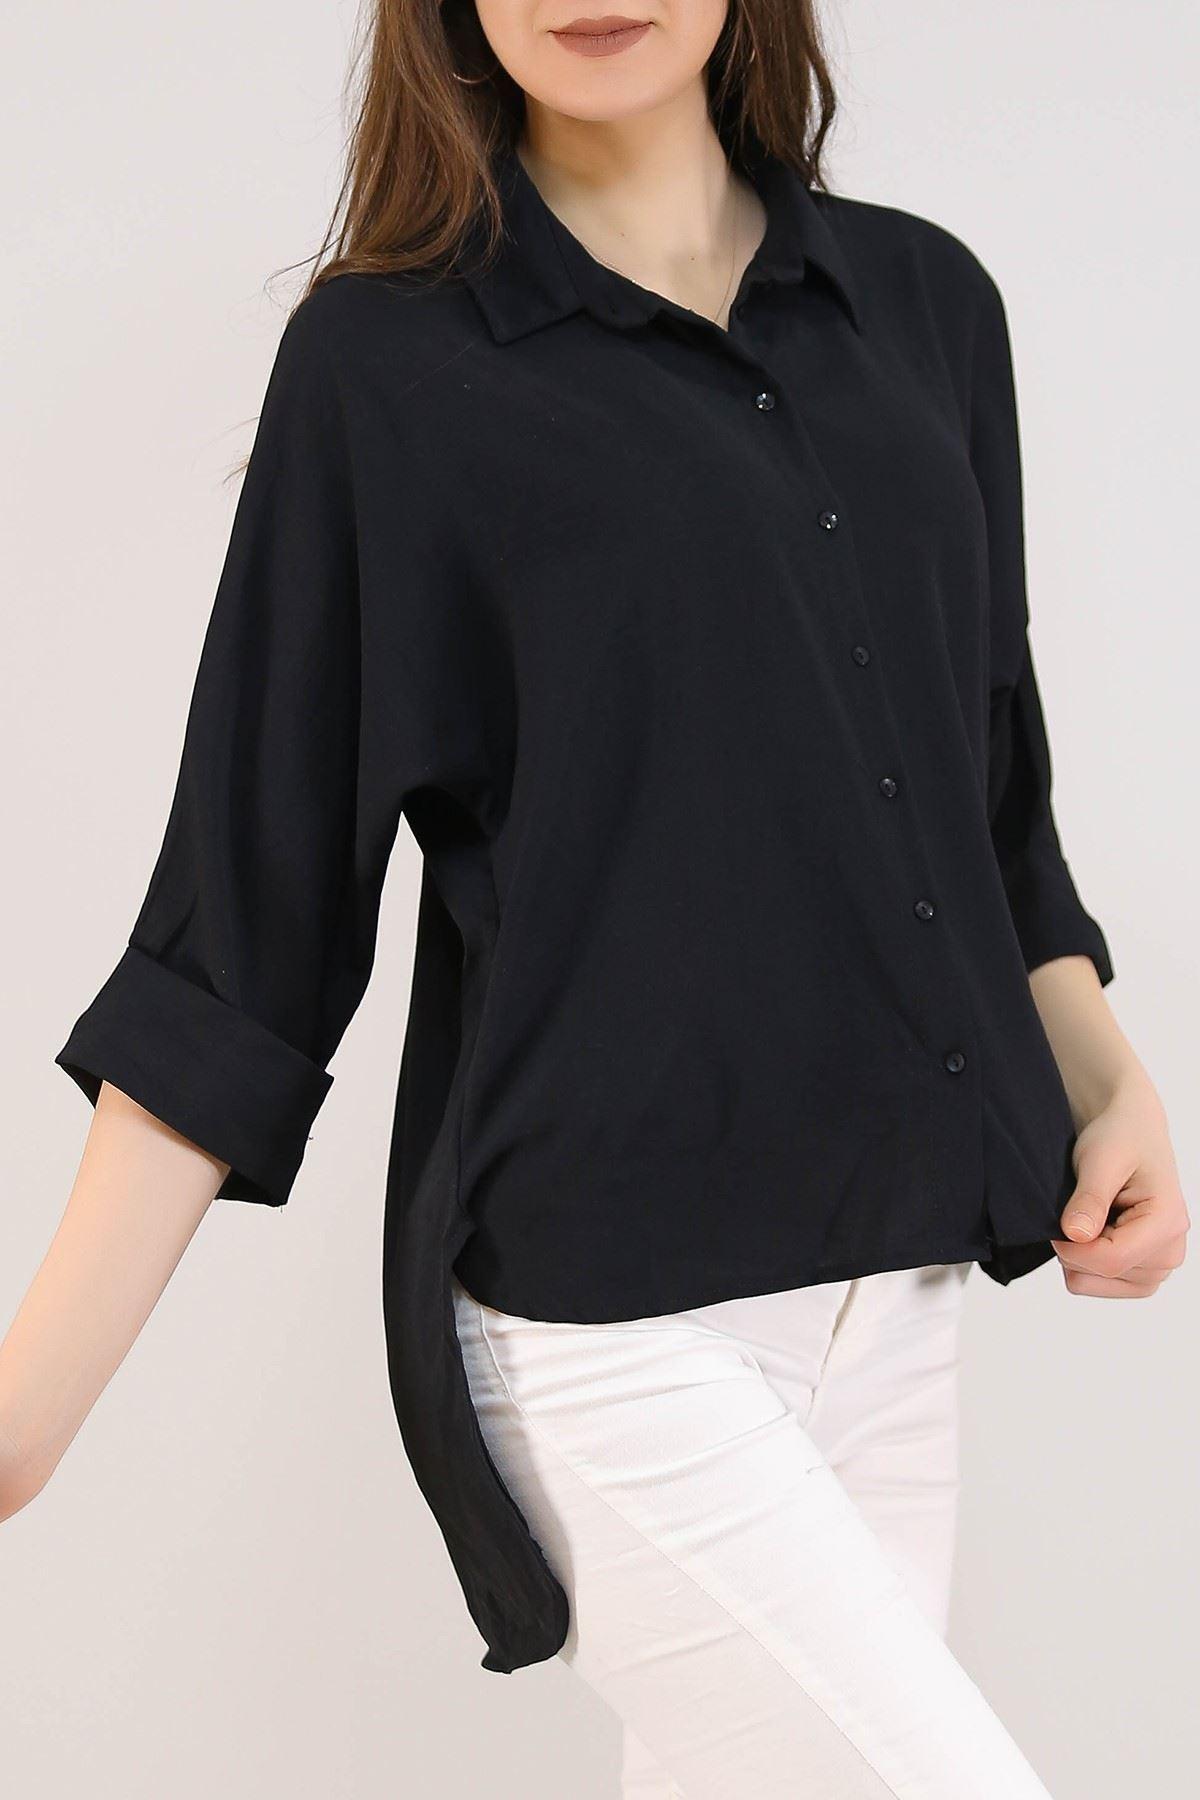 Salaş Kesim Kadın Gömlek Siyah - 3339.222.